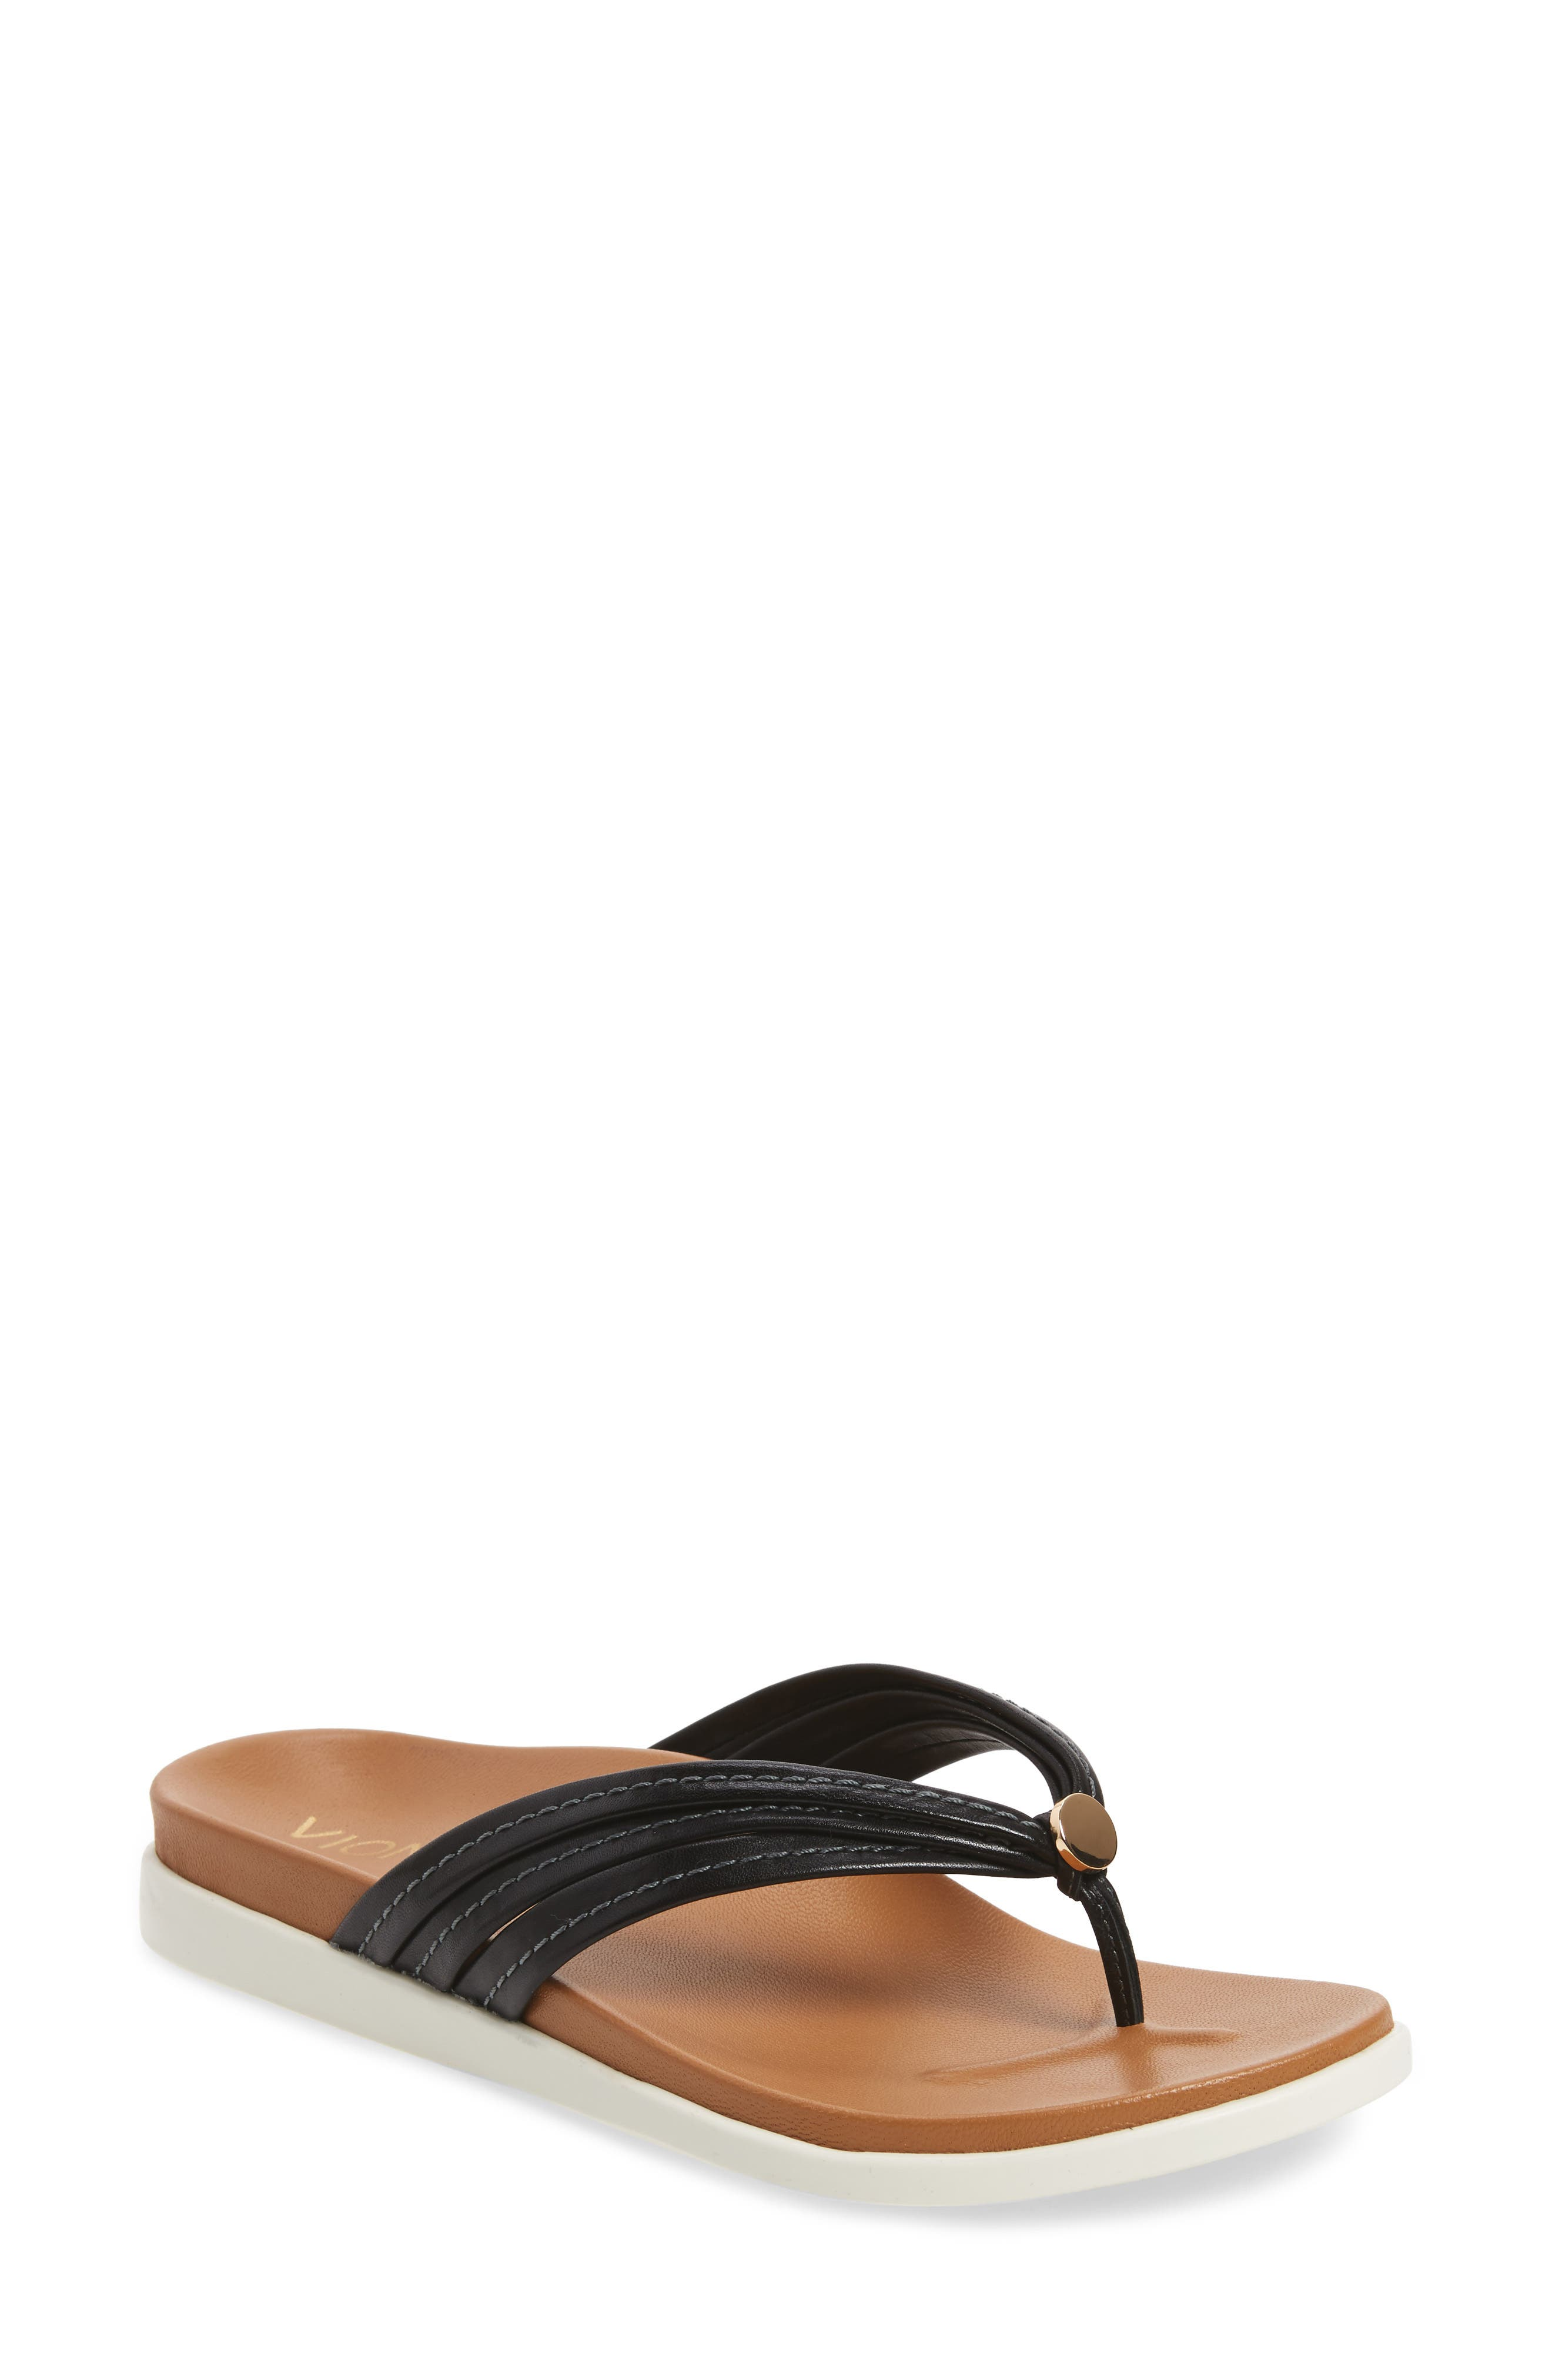 Catalina Flip Flop,                         Main,                         color, Black Leather